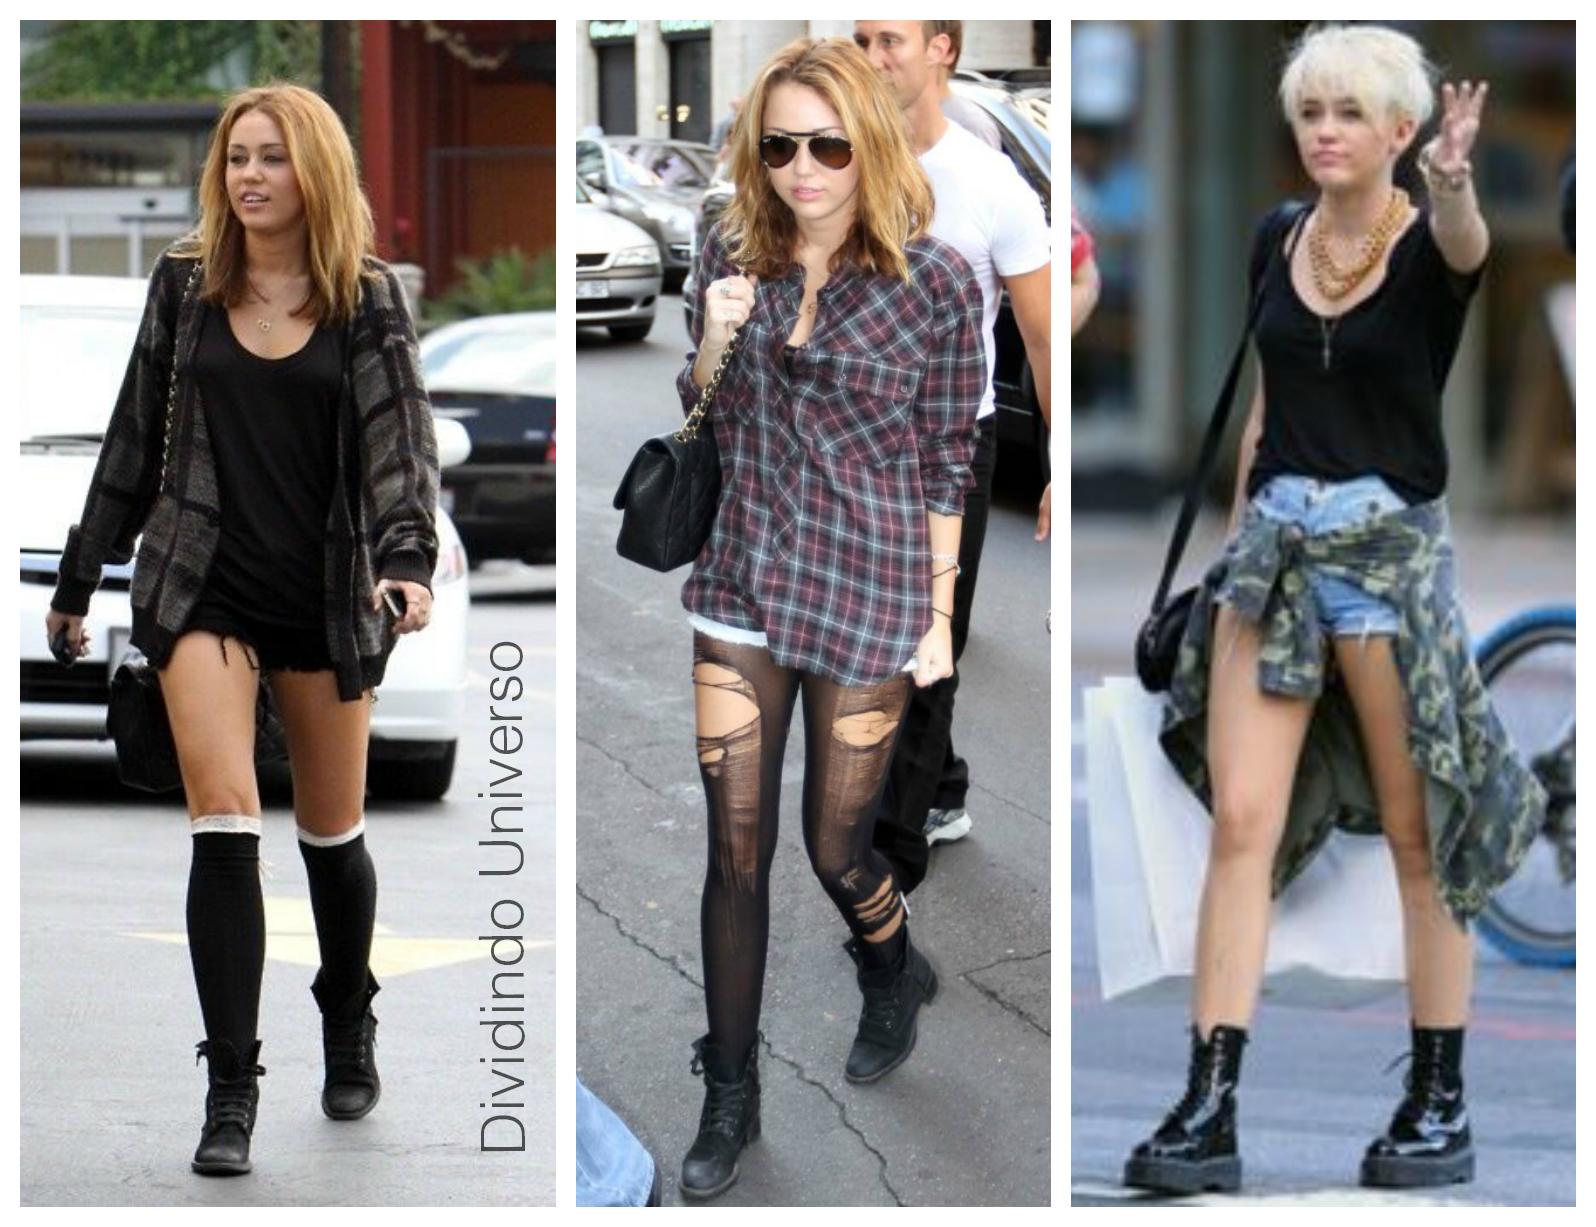 Miley cyrus, Miley Cyrus Tumblr, Miley Cyrus Look, Miley Cyrus Coturno, Miley Cyrus Look Tumblr